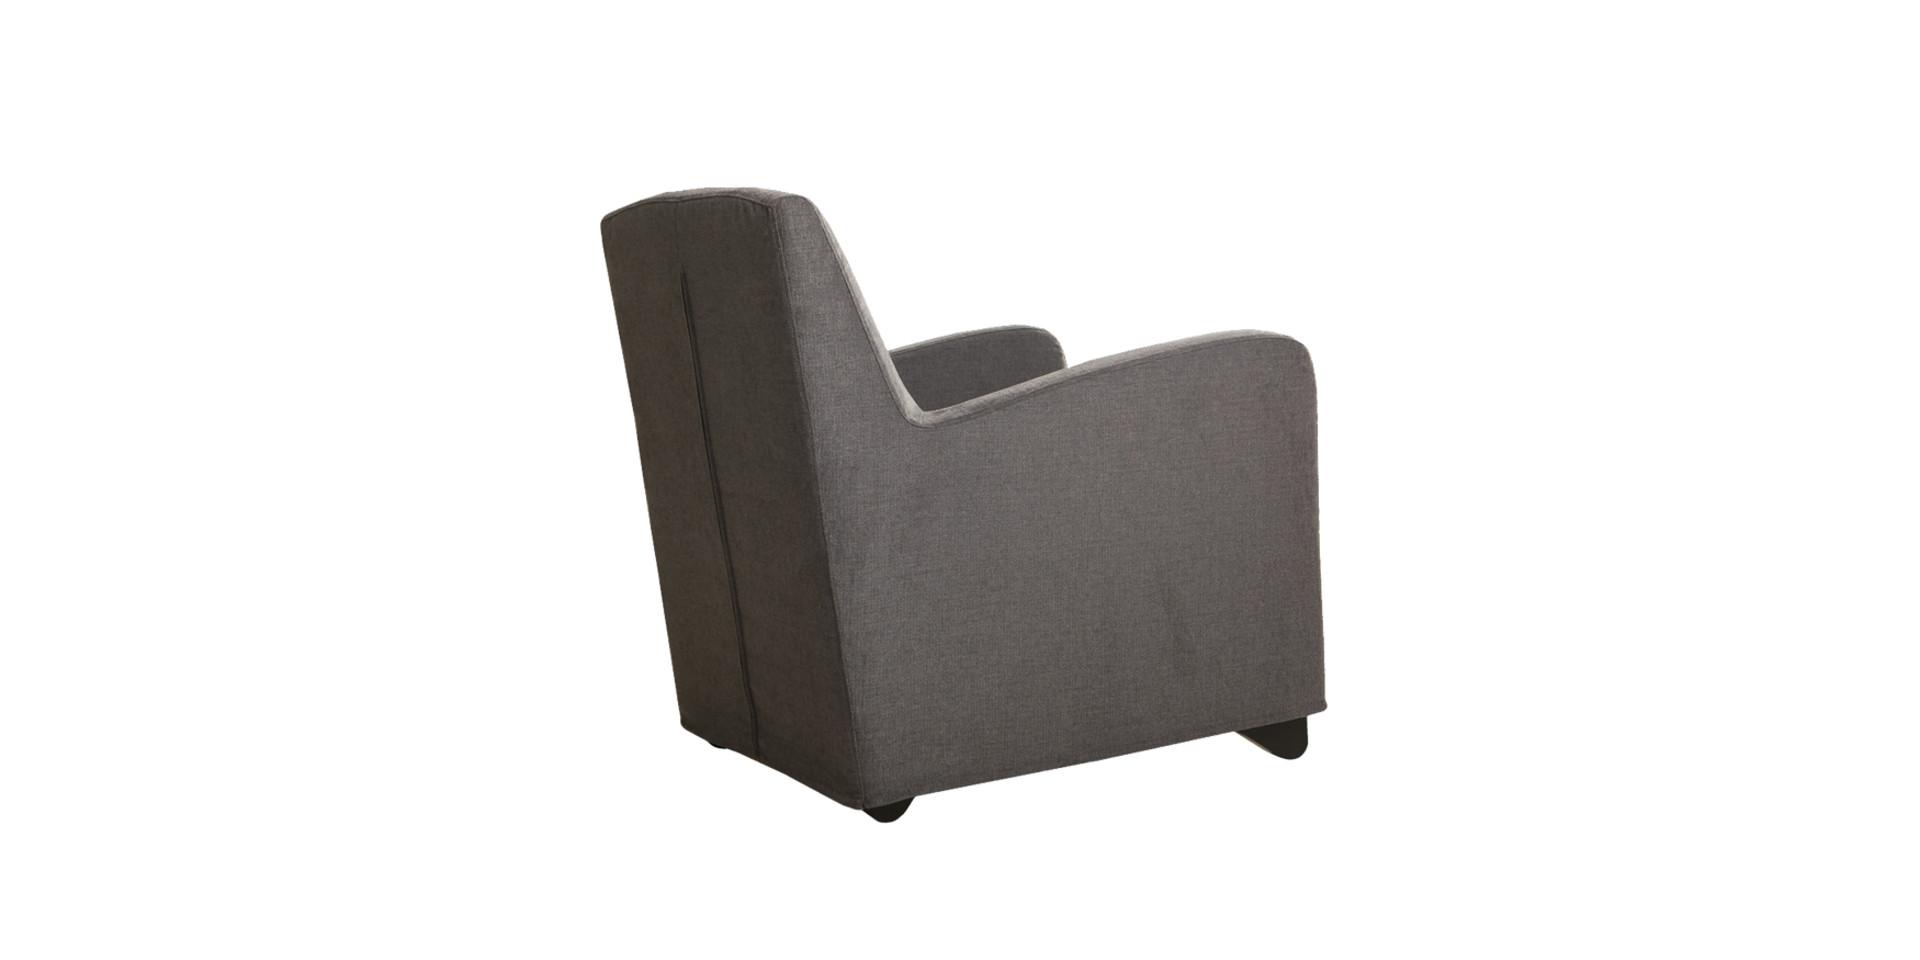 sits-mattis-fauteuil-armchair_drom54_grey_4